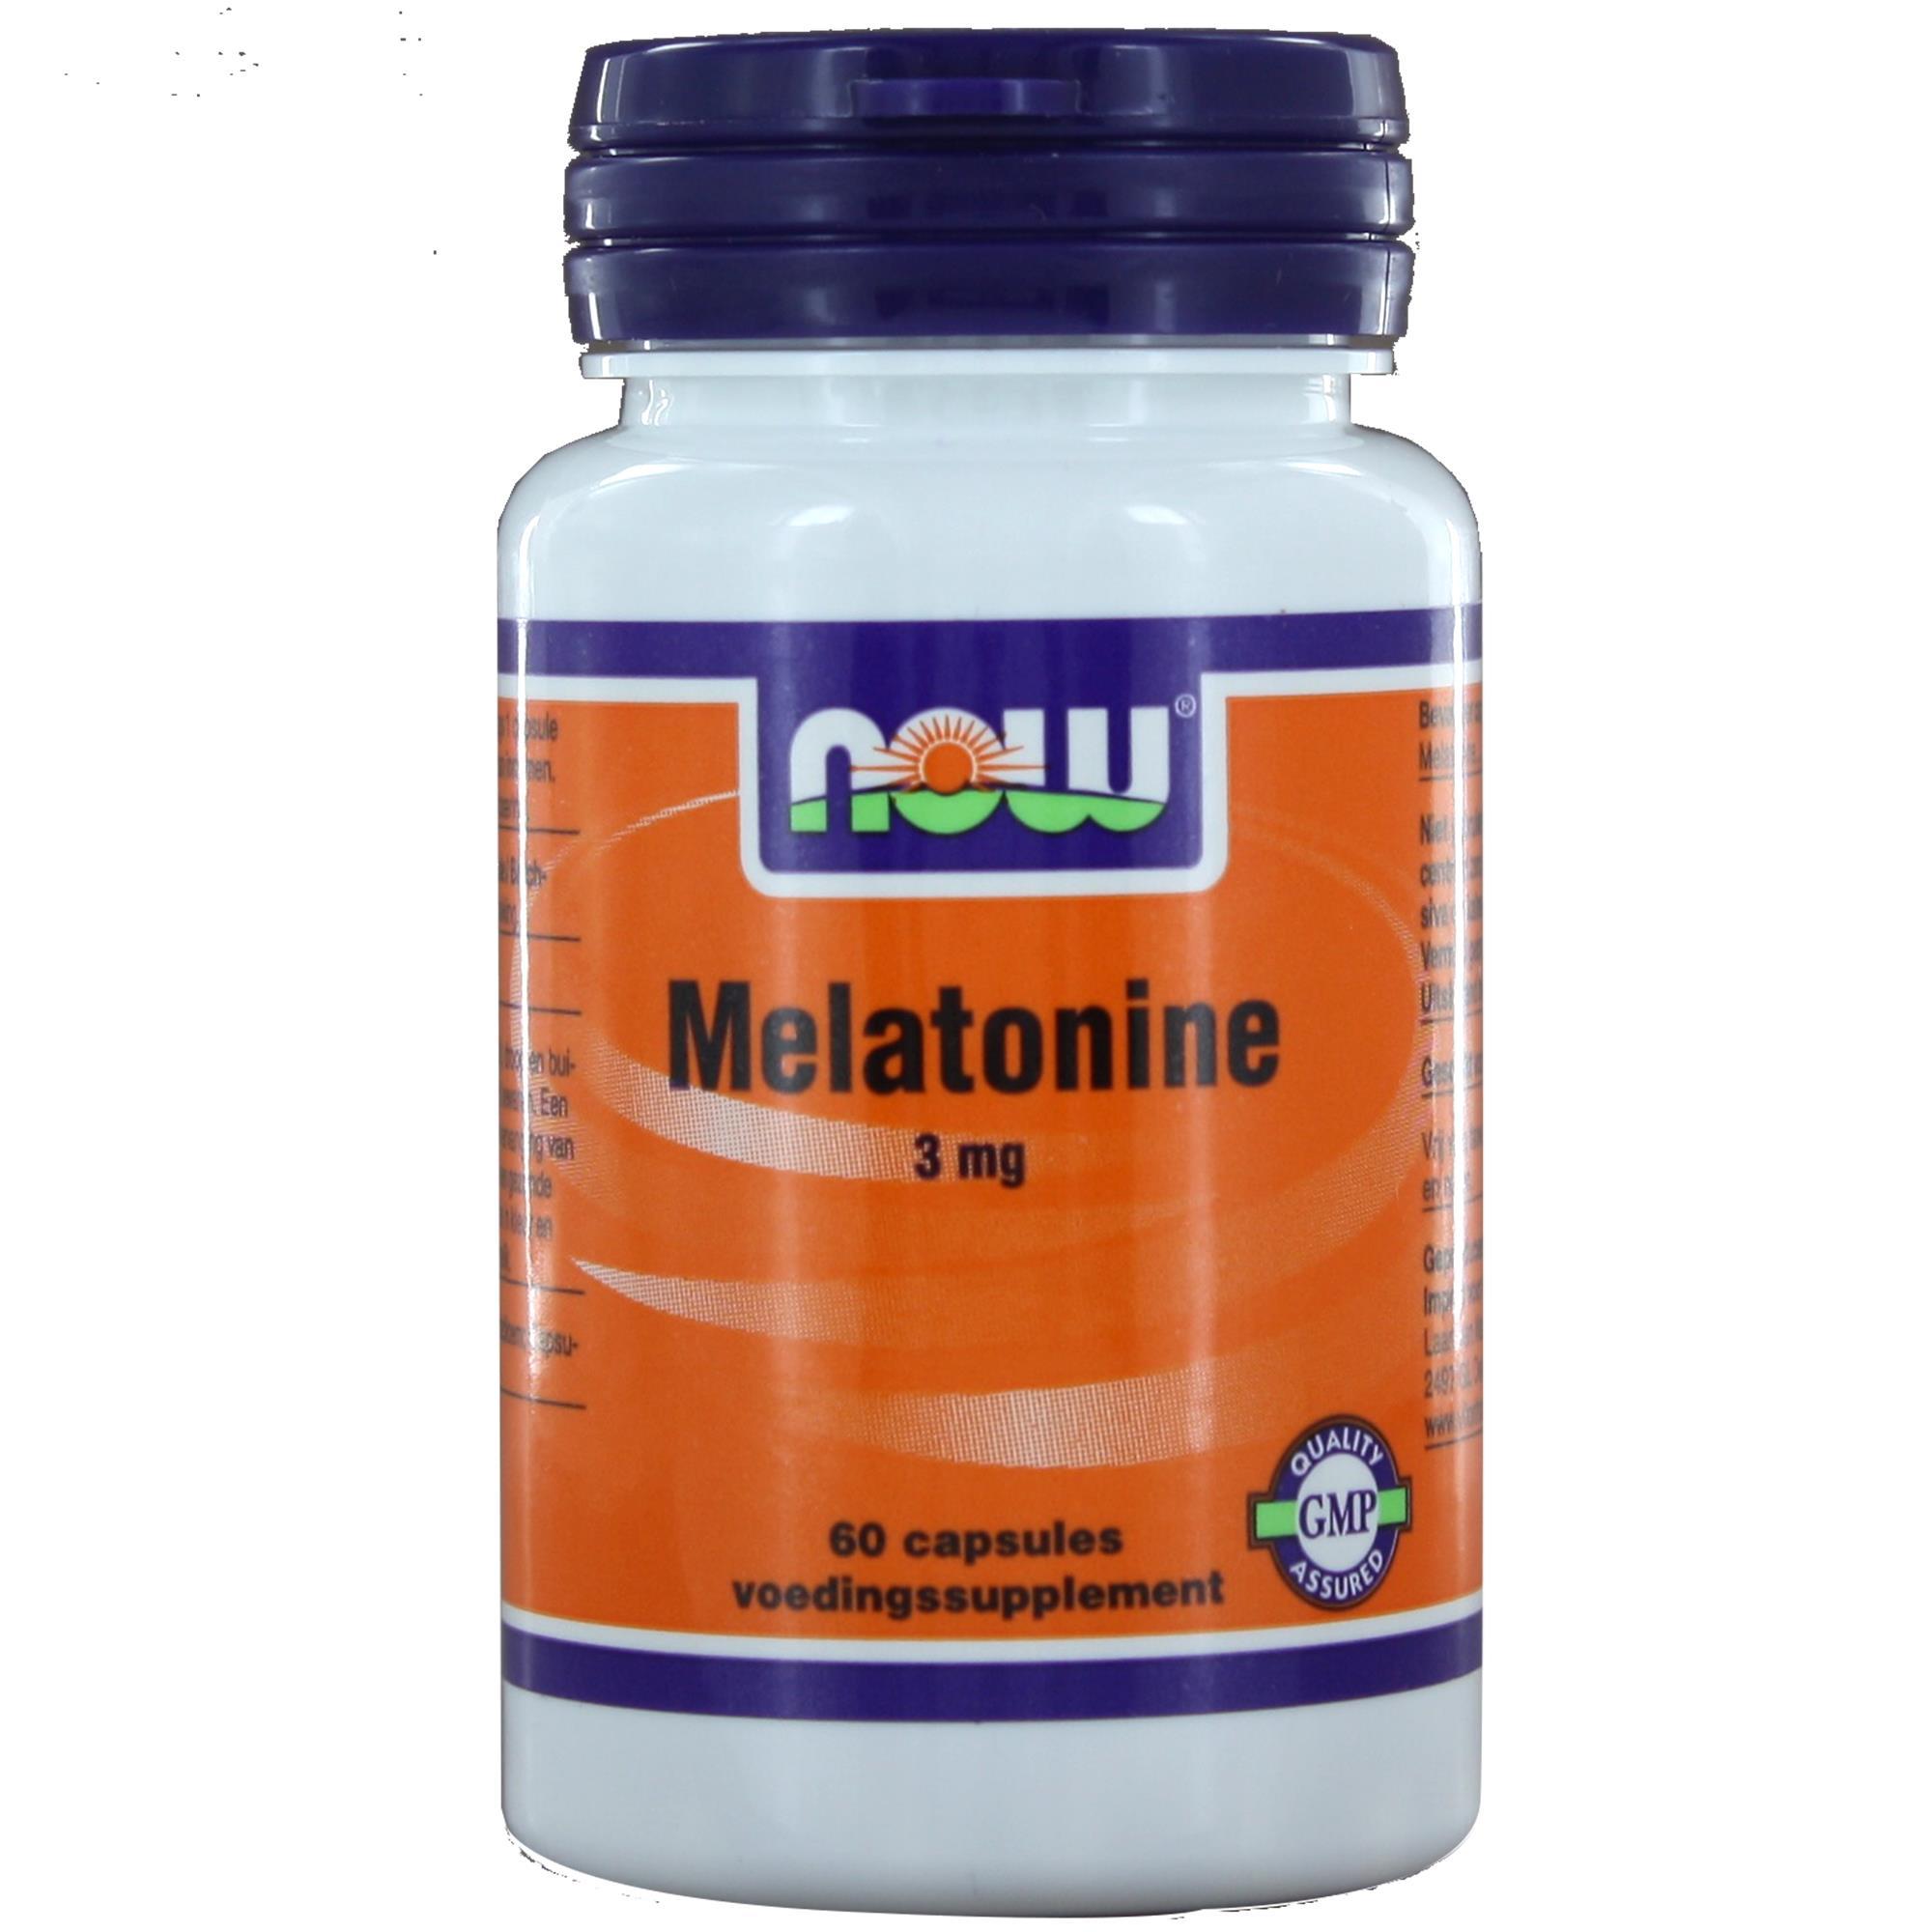 img 8916 - Melatonine 3 mg (60 caps) - NOW Foods